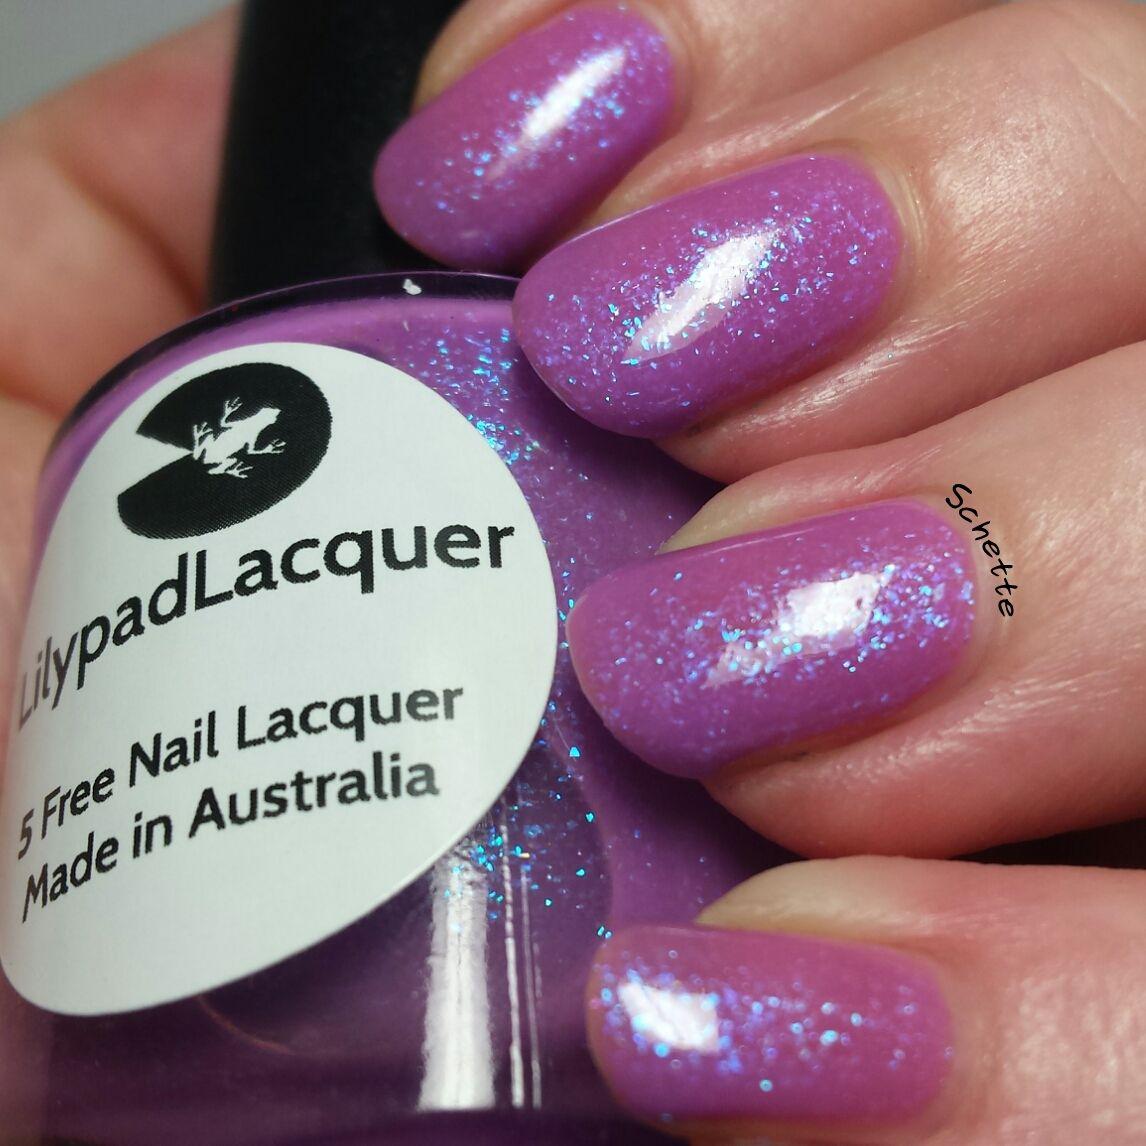 Lilypad Lacquer - Lilac Diamonds   Lilypad   Pinterest   Lilacs and ...